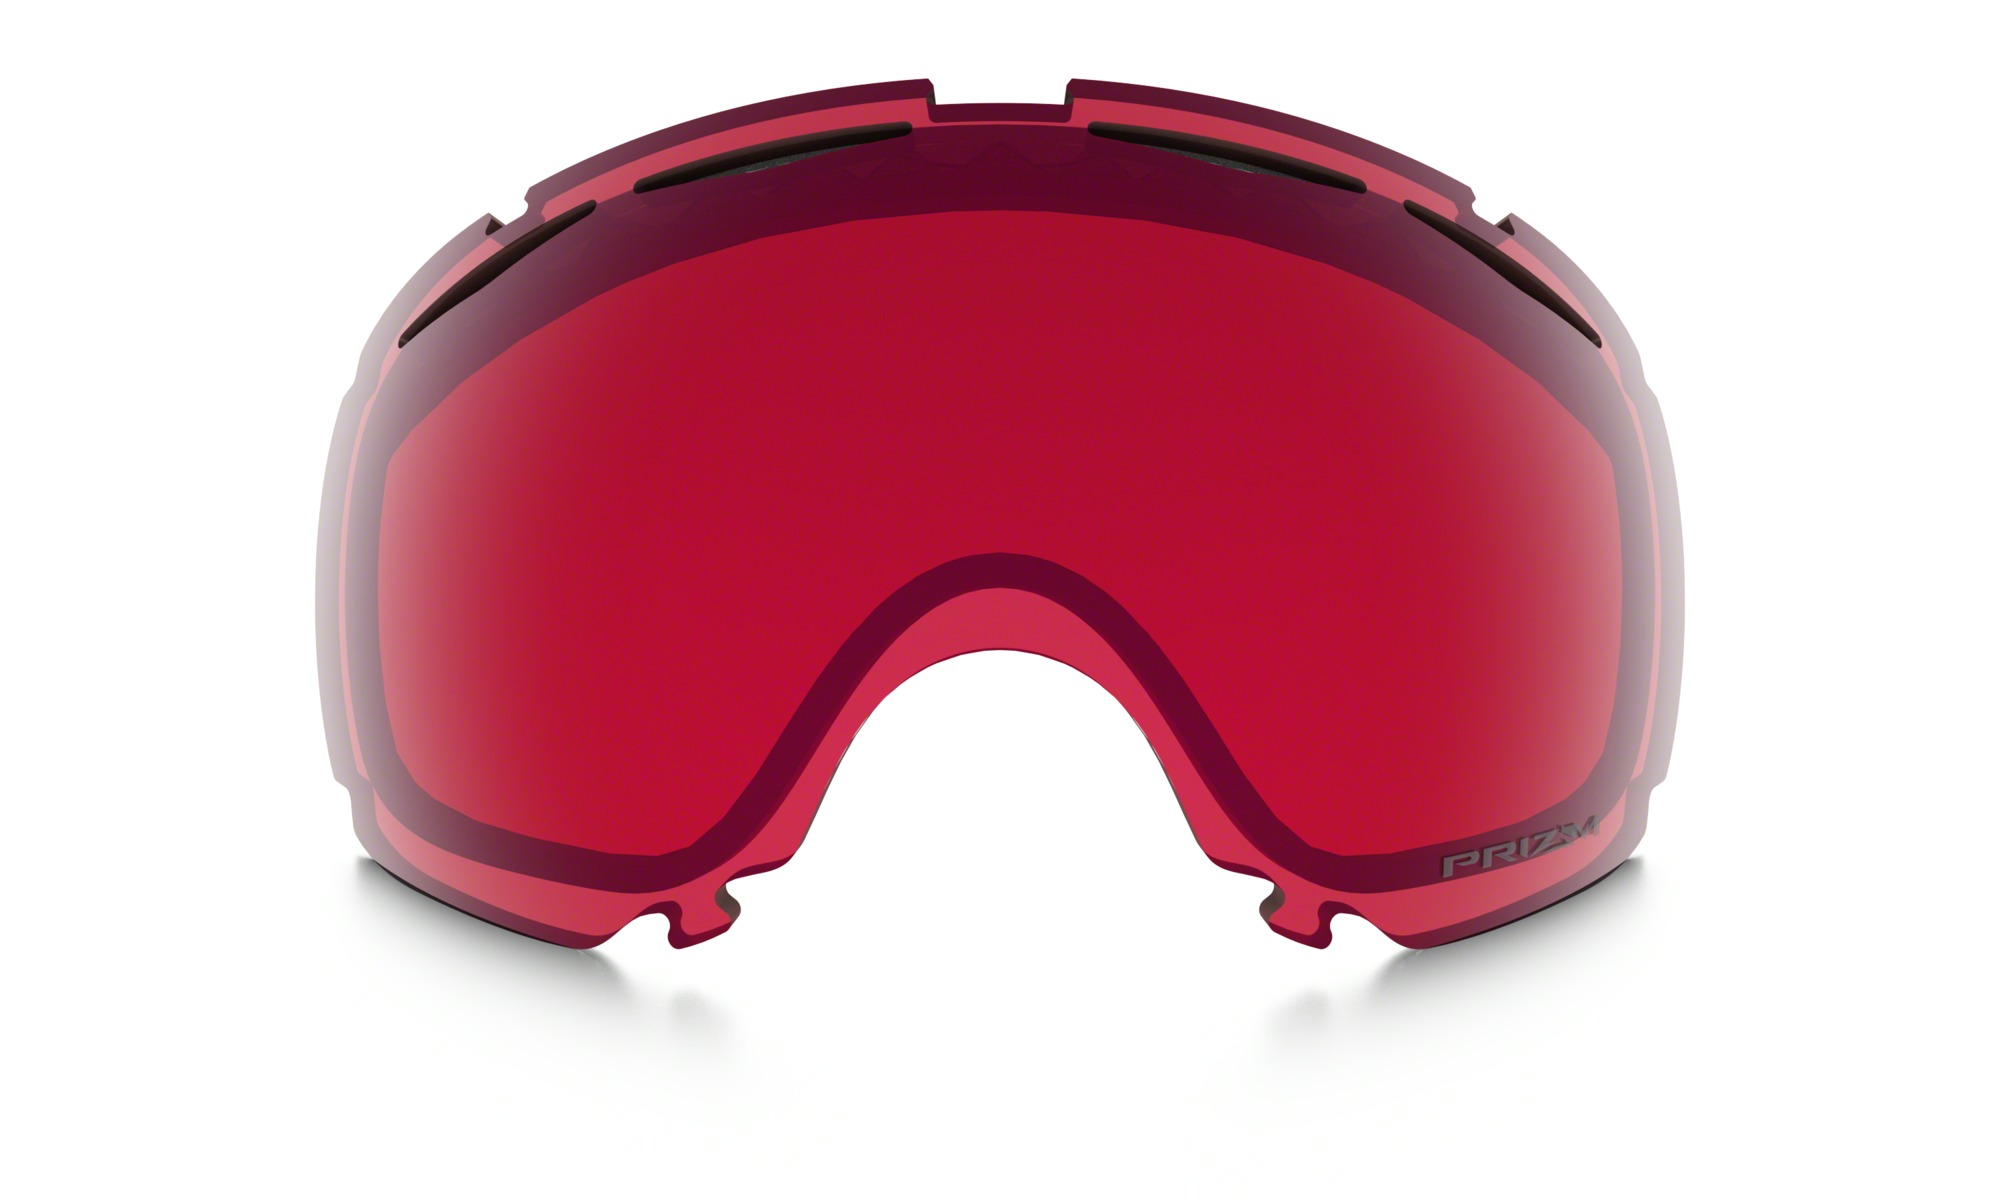 oakley ski helmets  Oakley Goggle Lens Color / Tint Guide